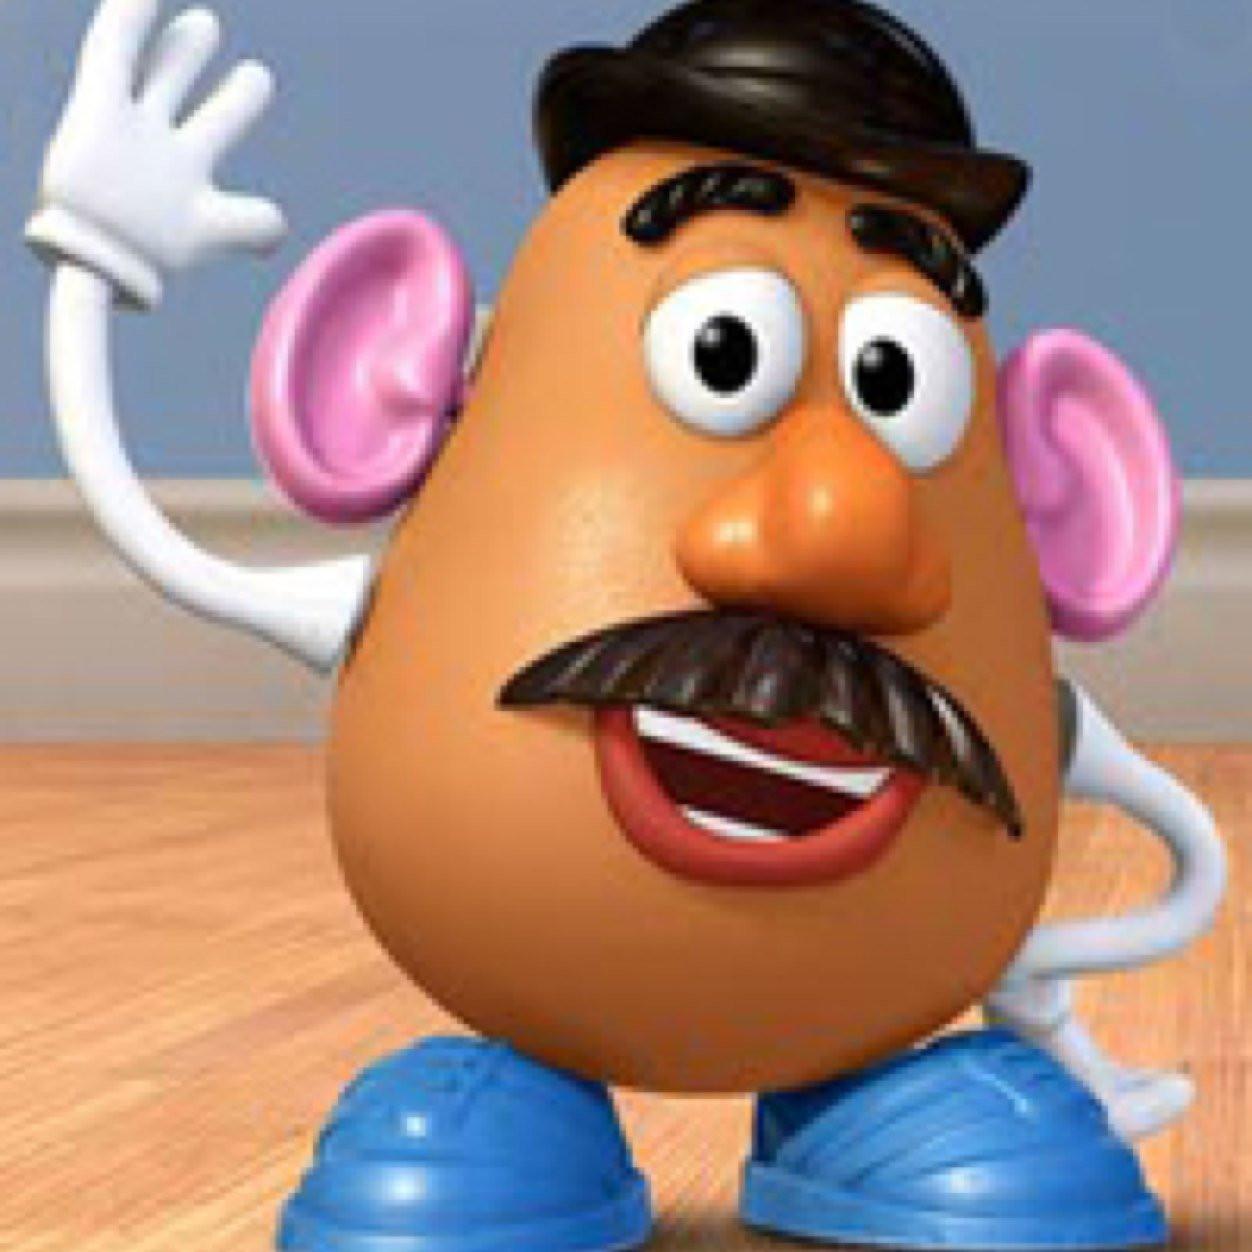 Mr Potato Head Voice  The iconic voice of Toy Story s Mr Potato Head has d